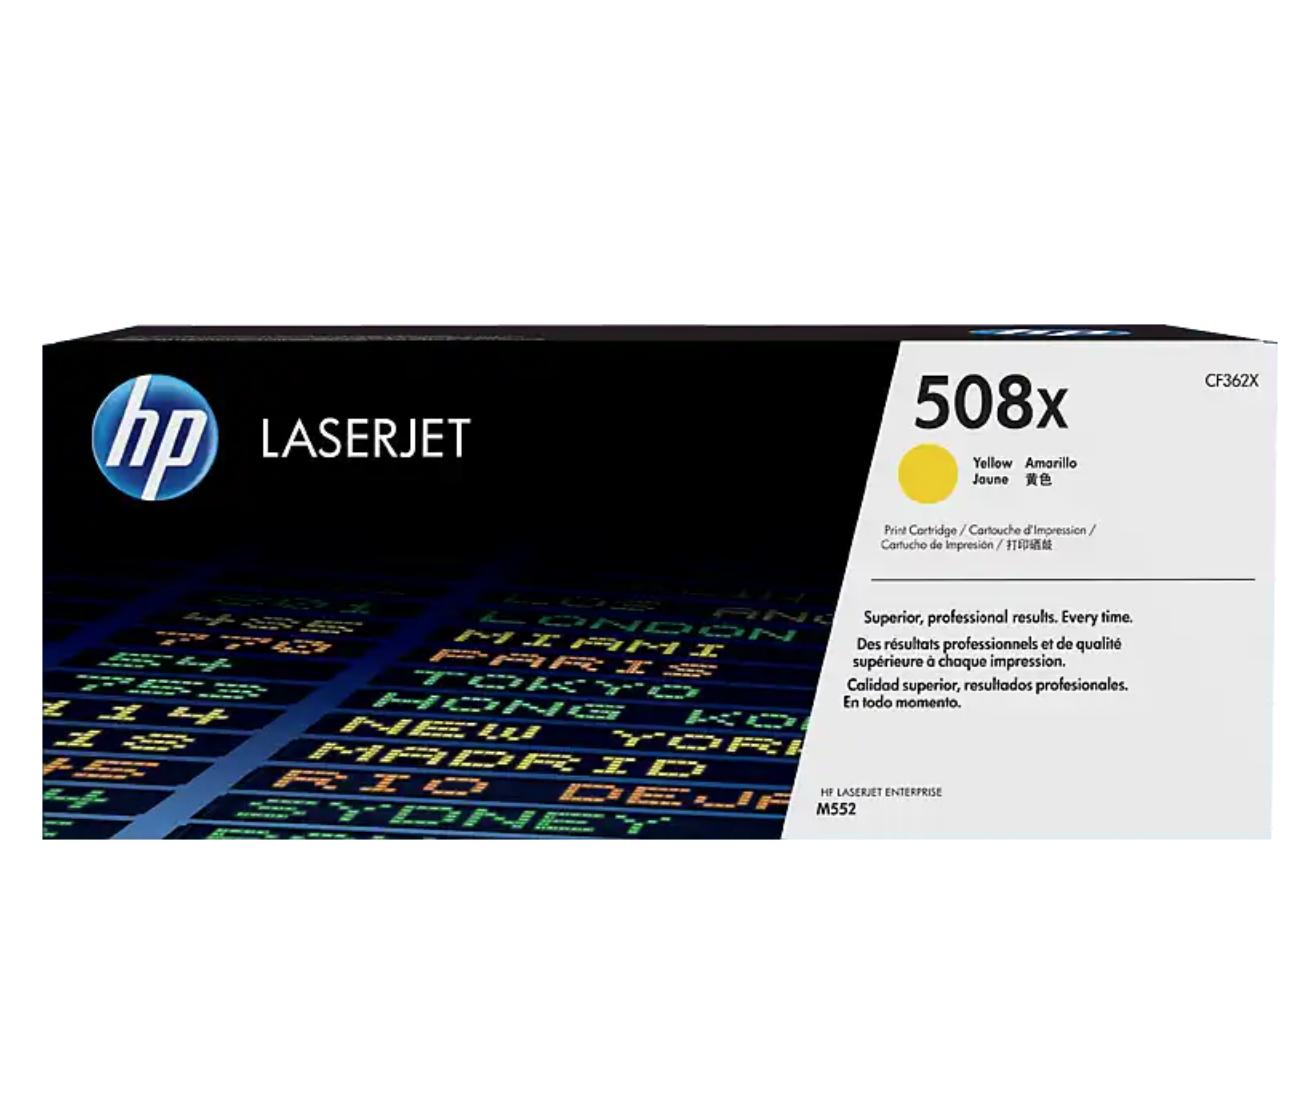 HP 508X 高打印量黃色原廠 LaserJet 碳粉 CF362X